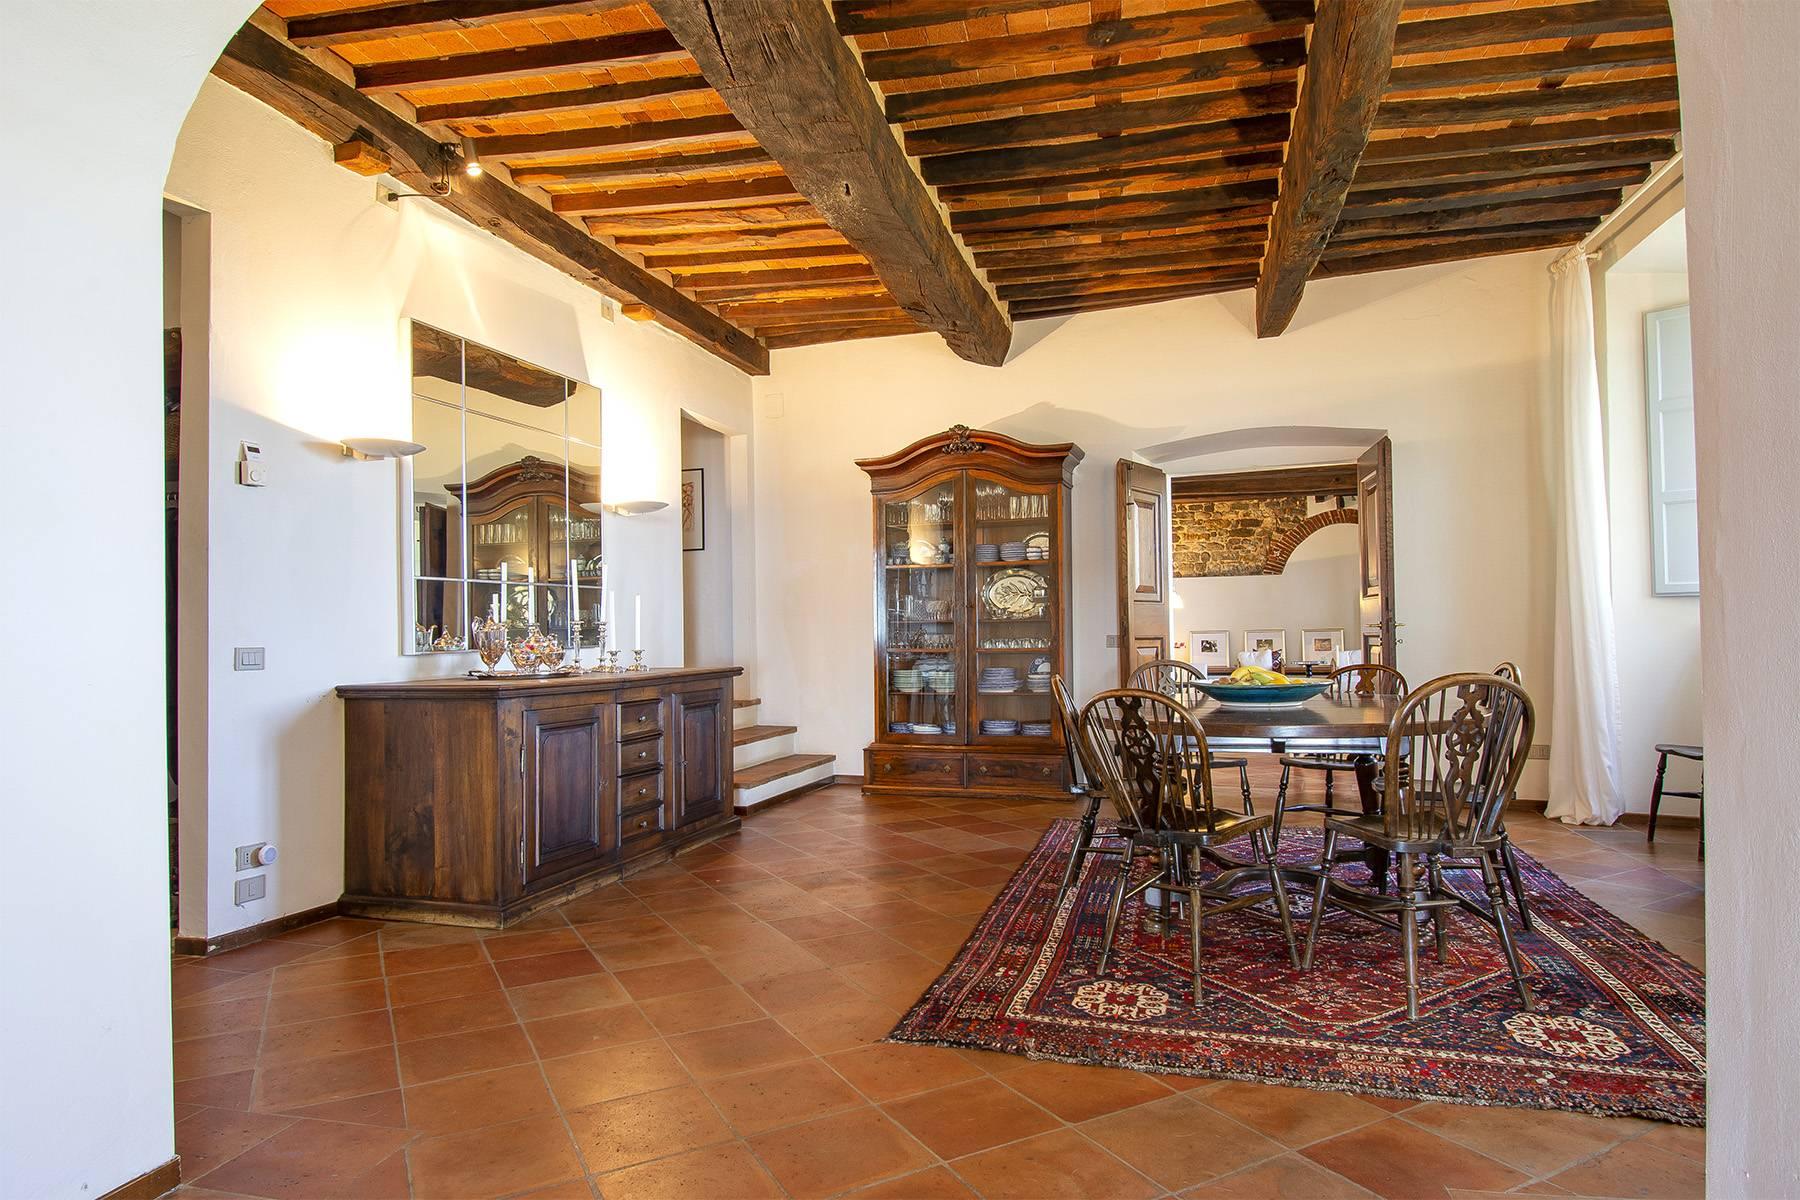 Villa in Vendita a Capannori: 5 locali, 380 mq - Foto 10